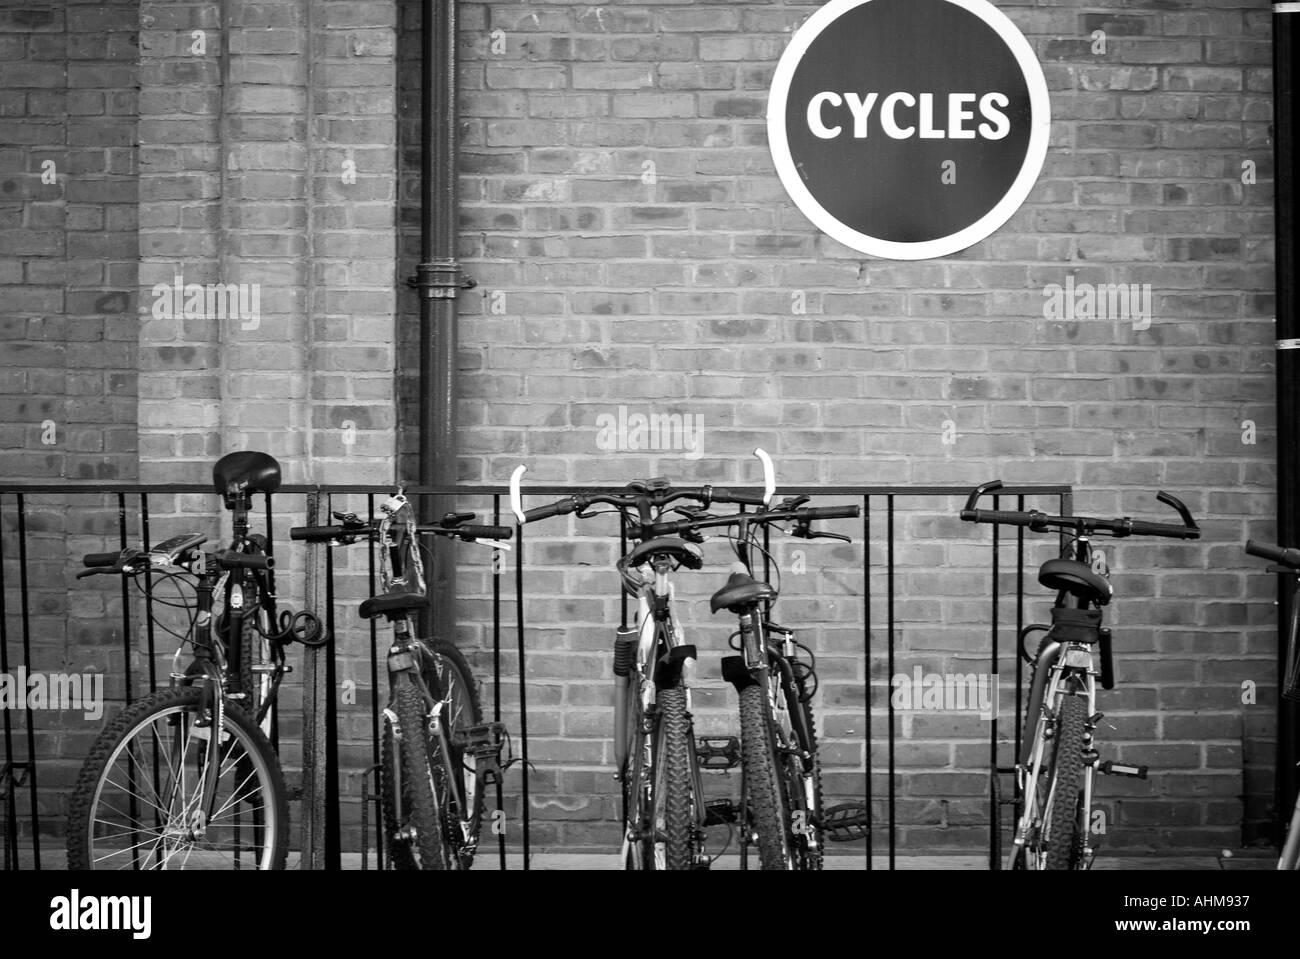 Bike rack cycle park green transport zero 0 emission vehicle pollution local journey mountain bike travel lock Stock Photo